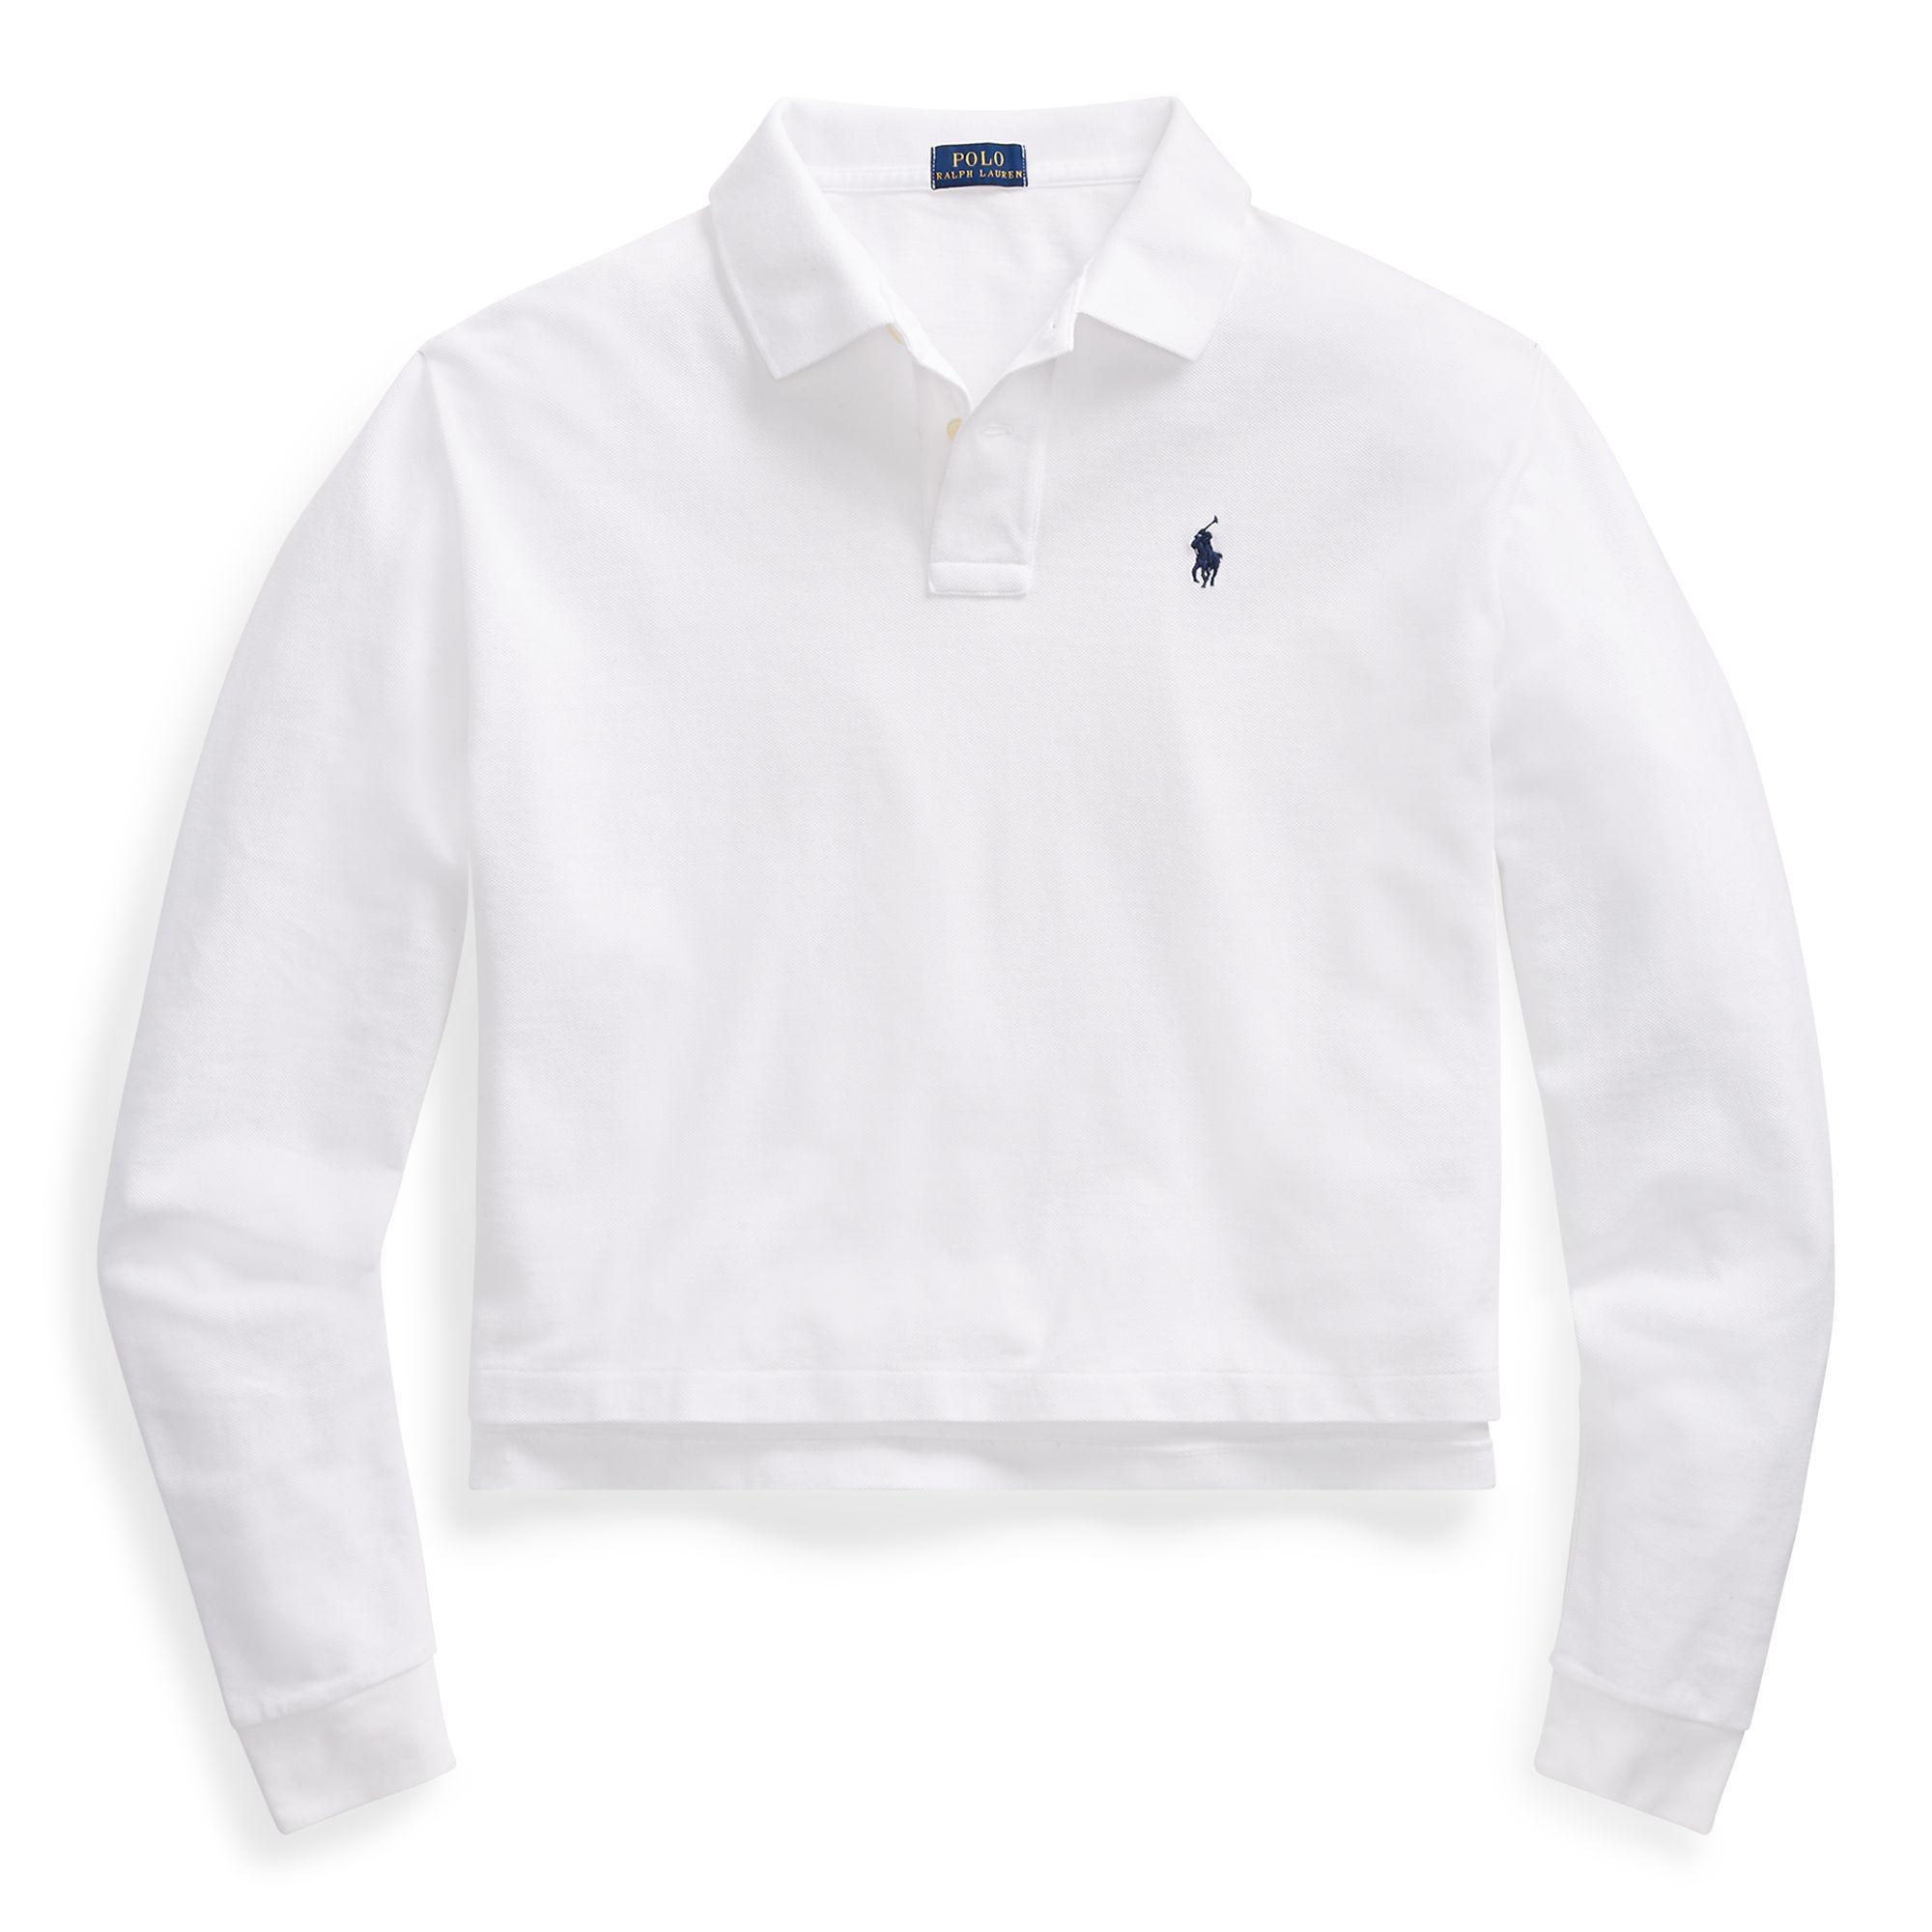 7551a3161ae60e ... uk polo ralph lauren white cropped mesh polo shirt lyst. view  fullscreen 052b4 3e169